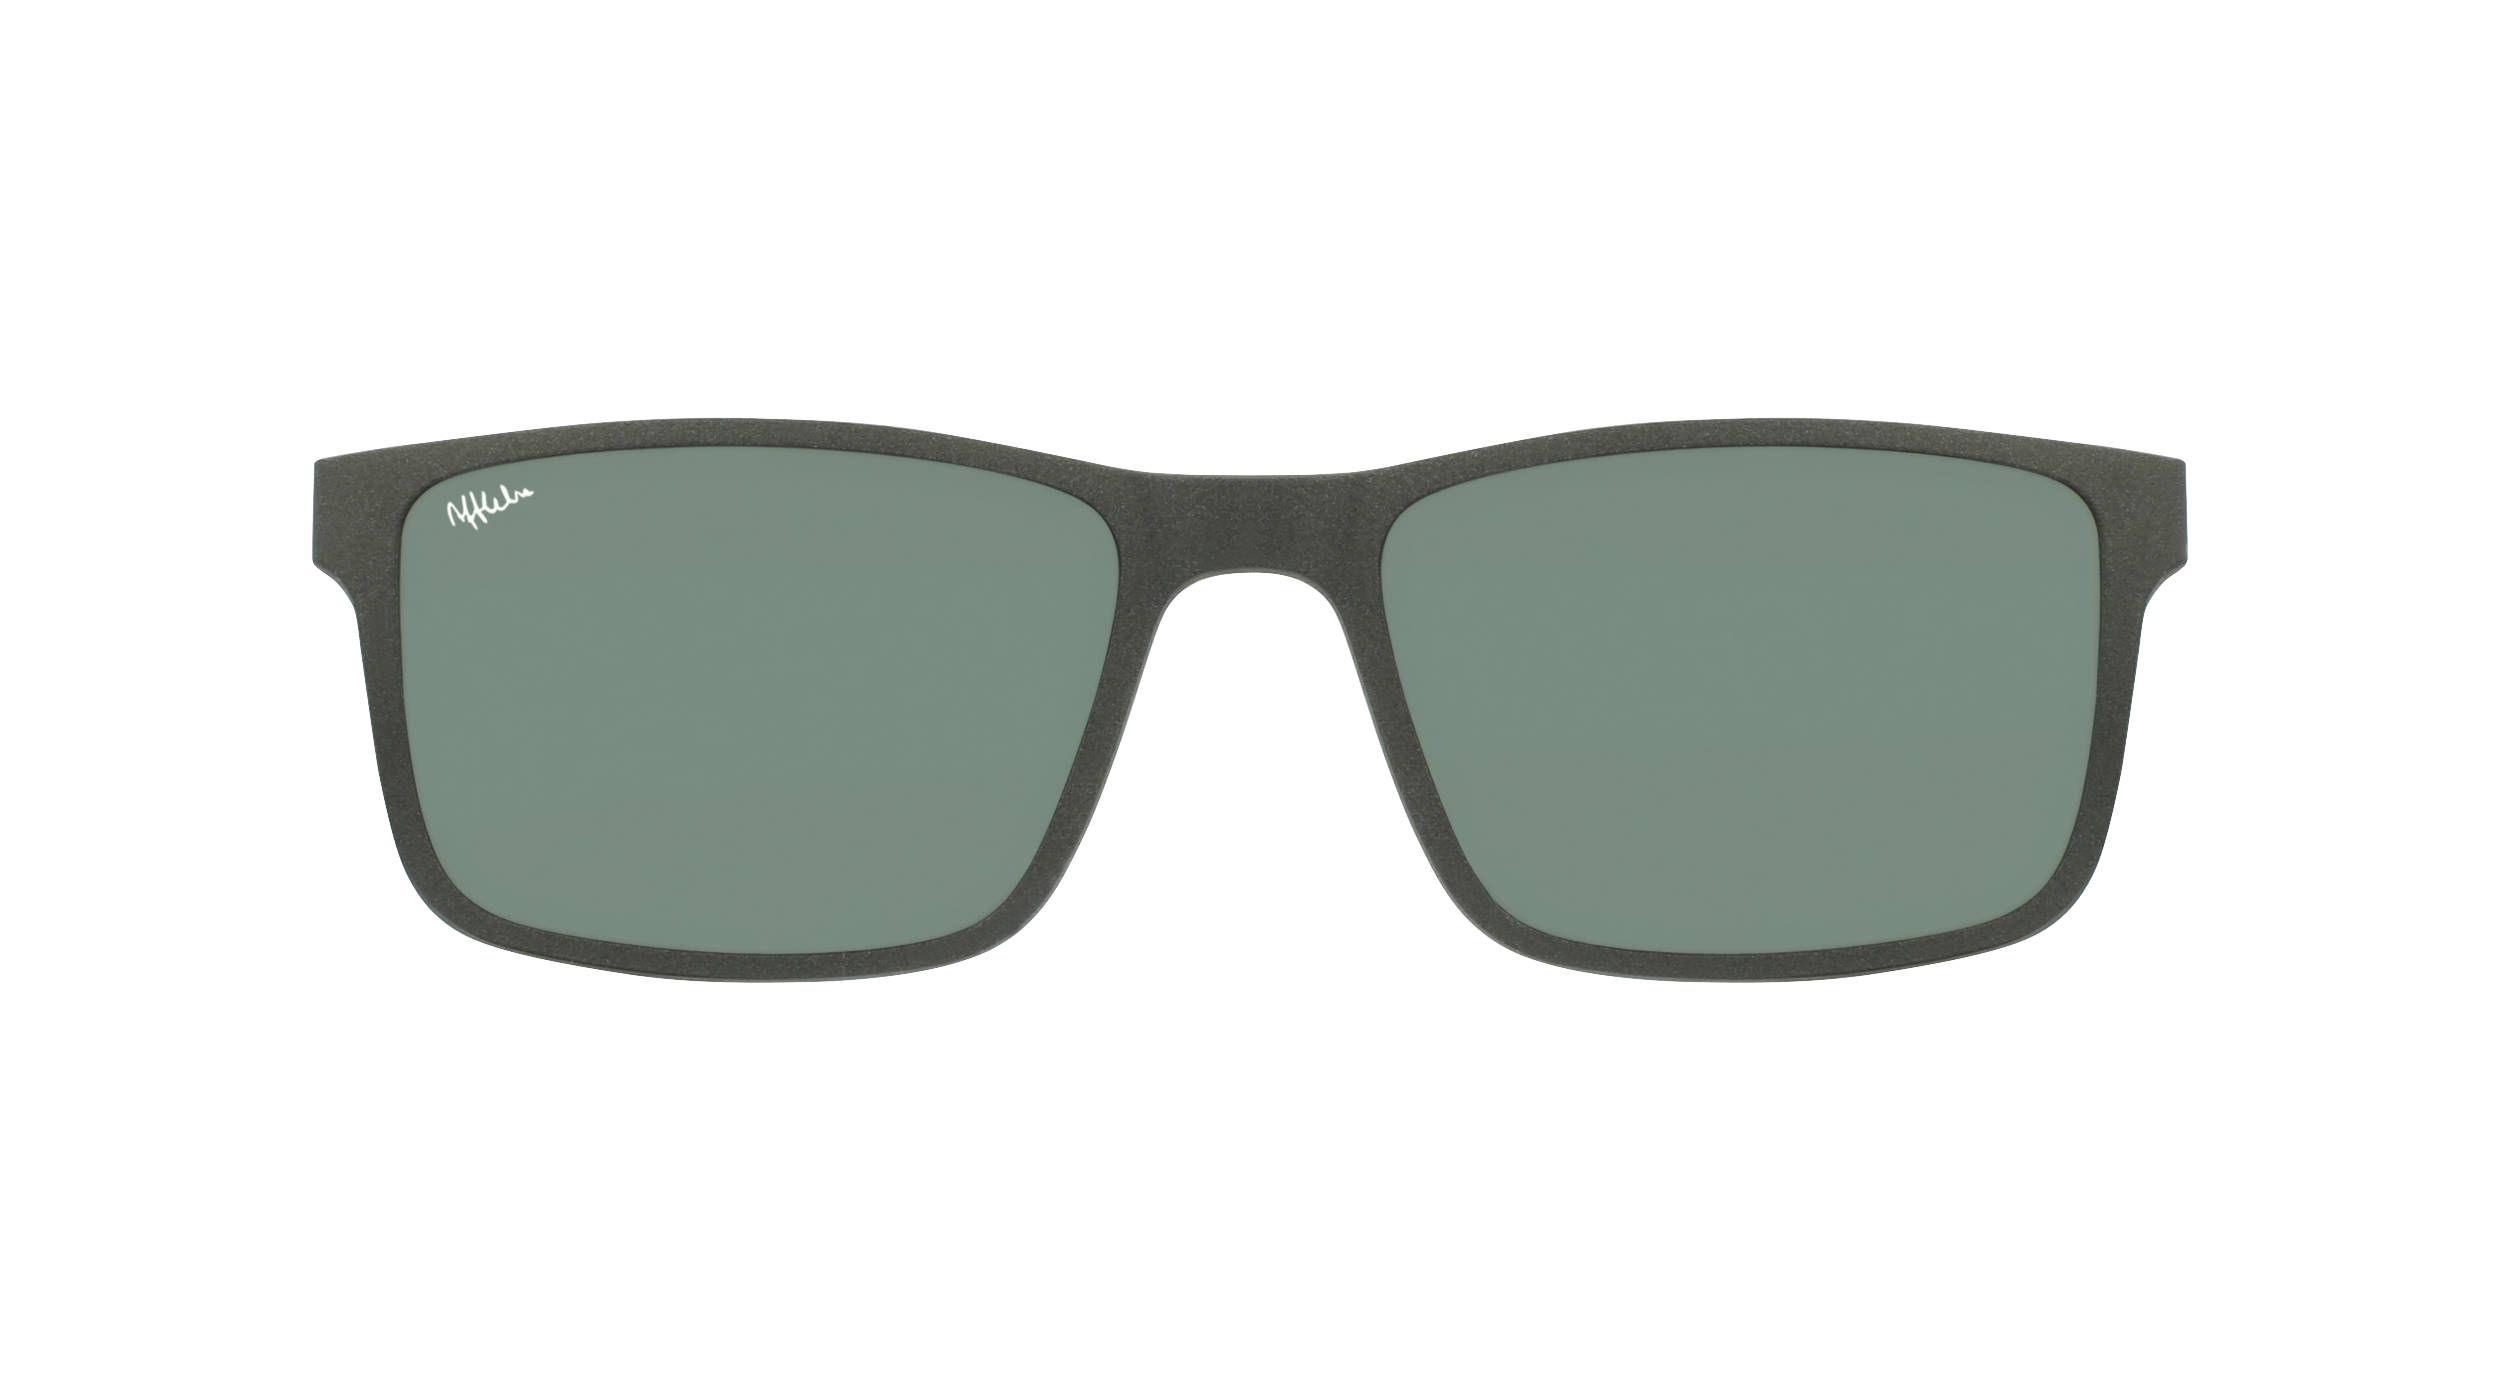 afflelou/france/products/smart_clip/clips_glasses/07630036457443.png